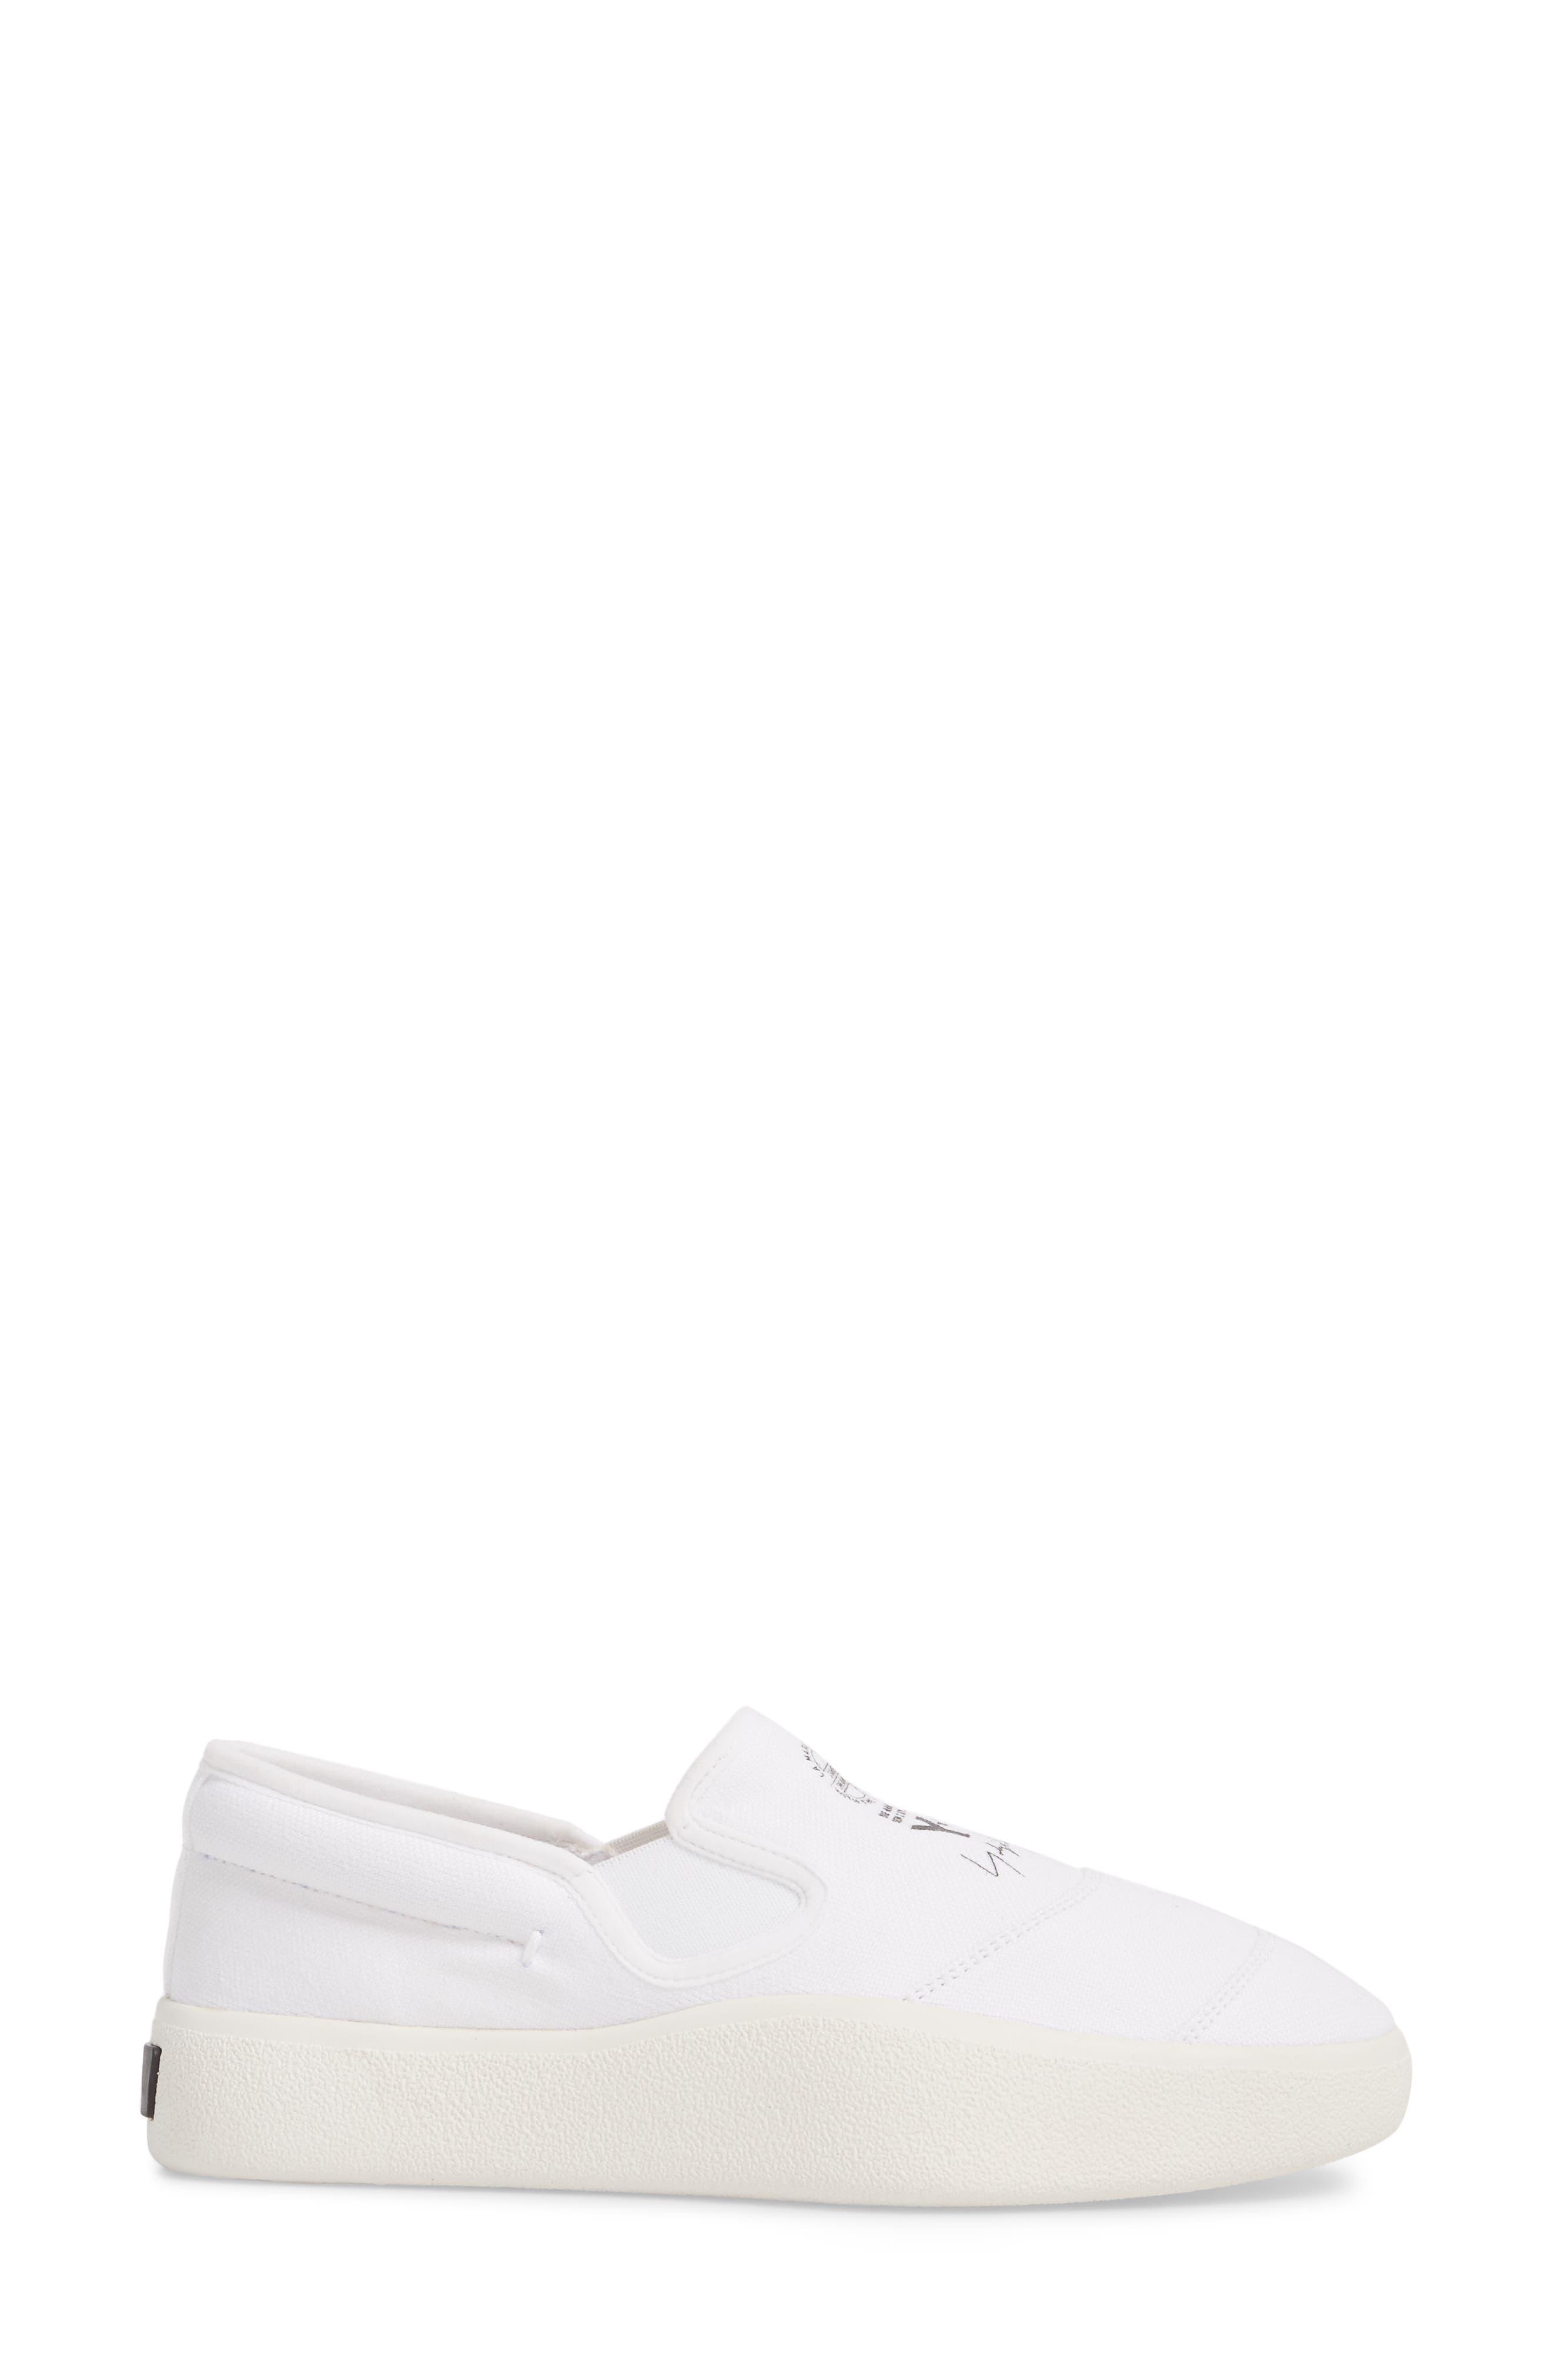 Alternate Image 3  - Y-3 Tangutsu Slip-On Sneaker (Women)